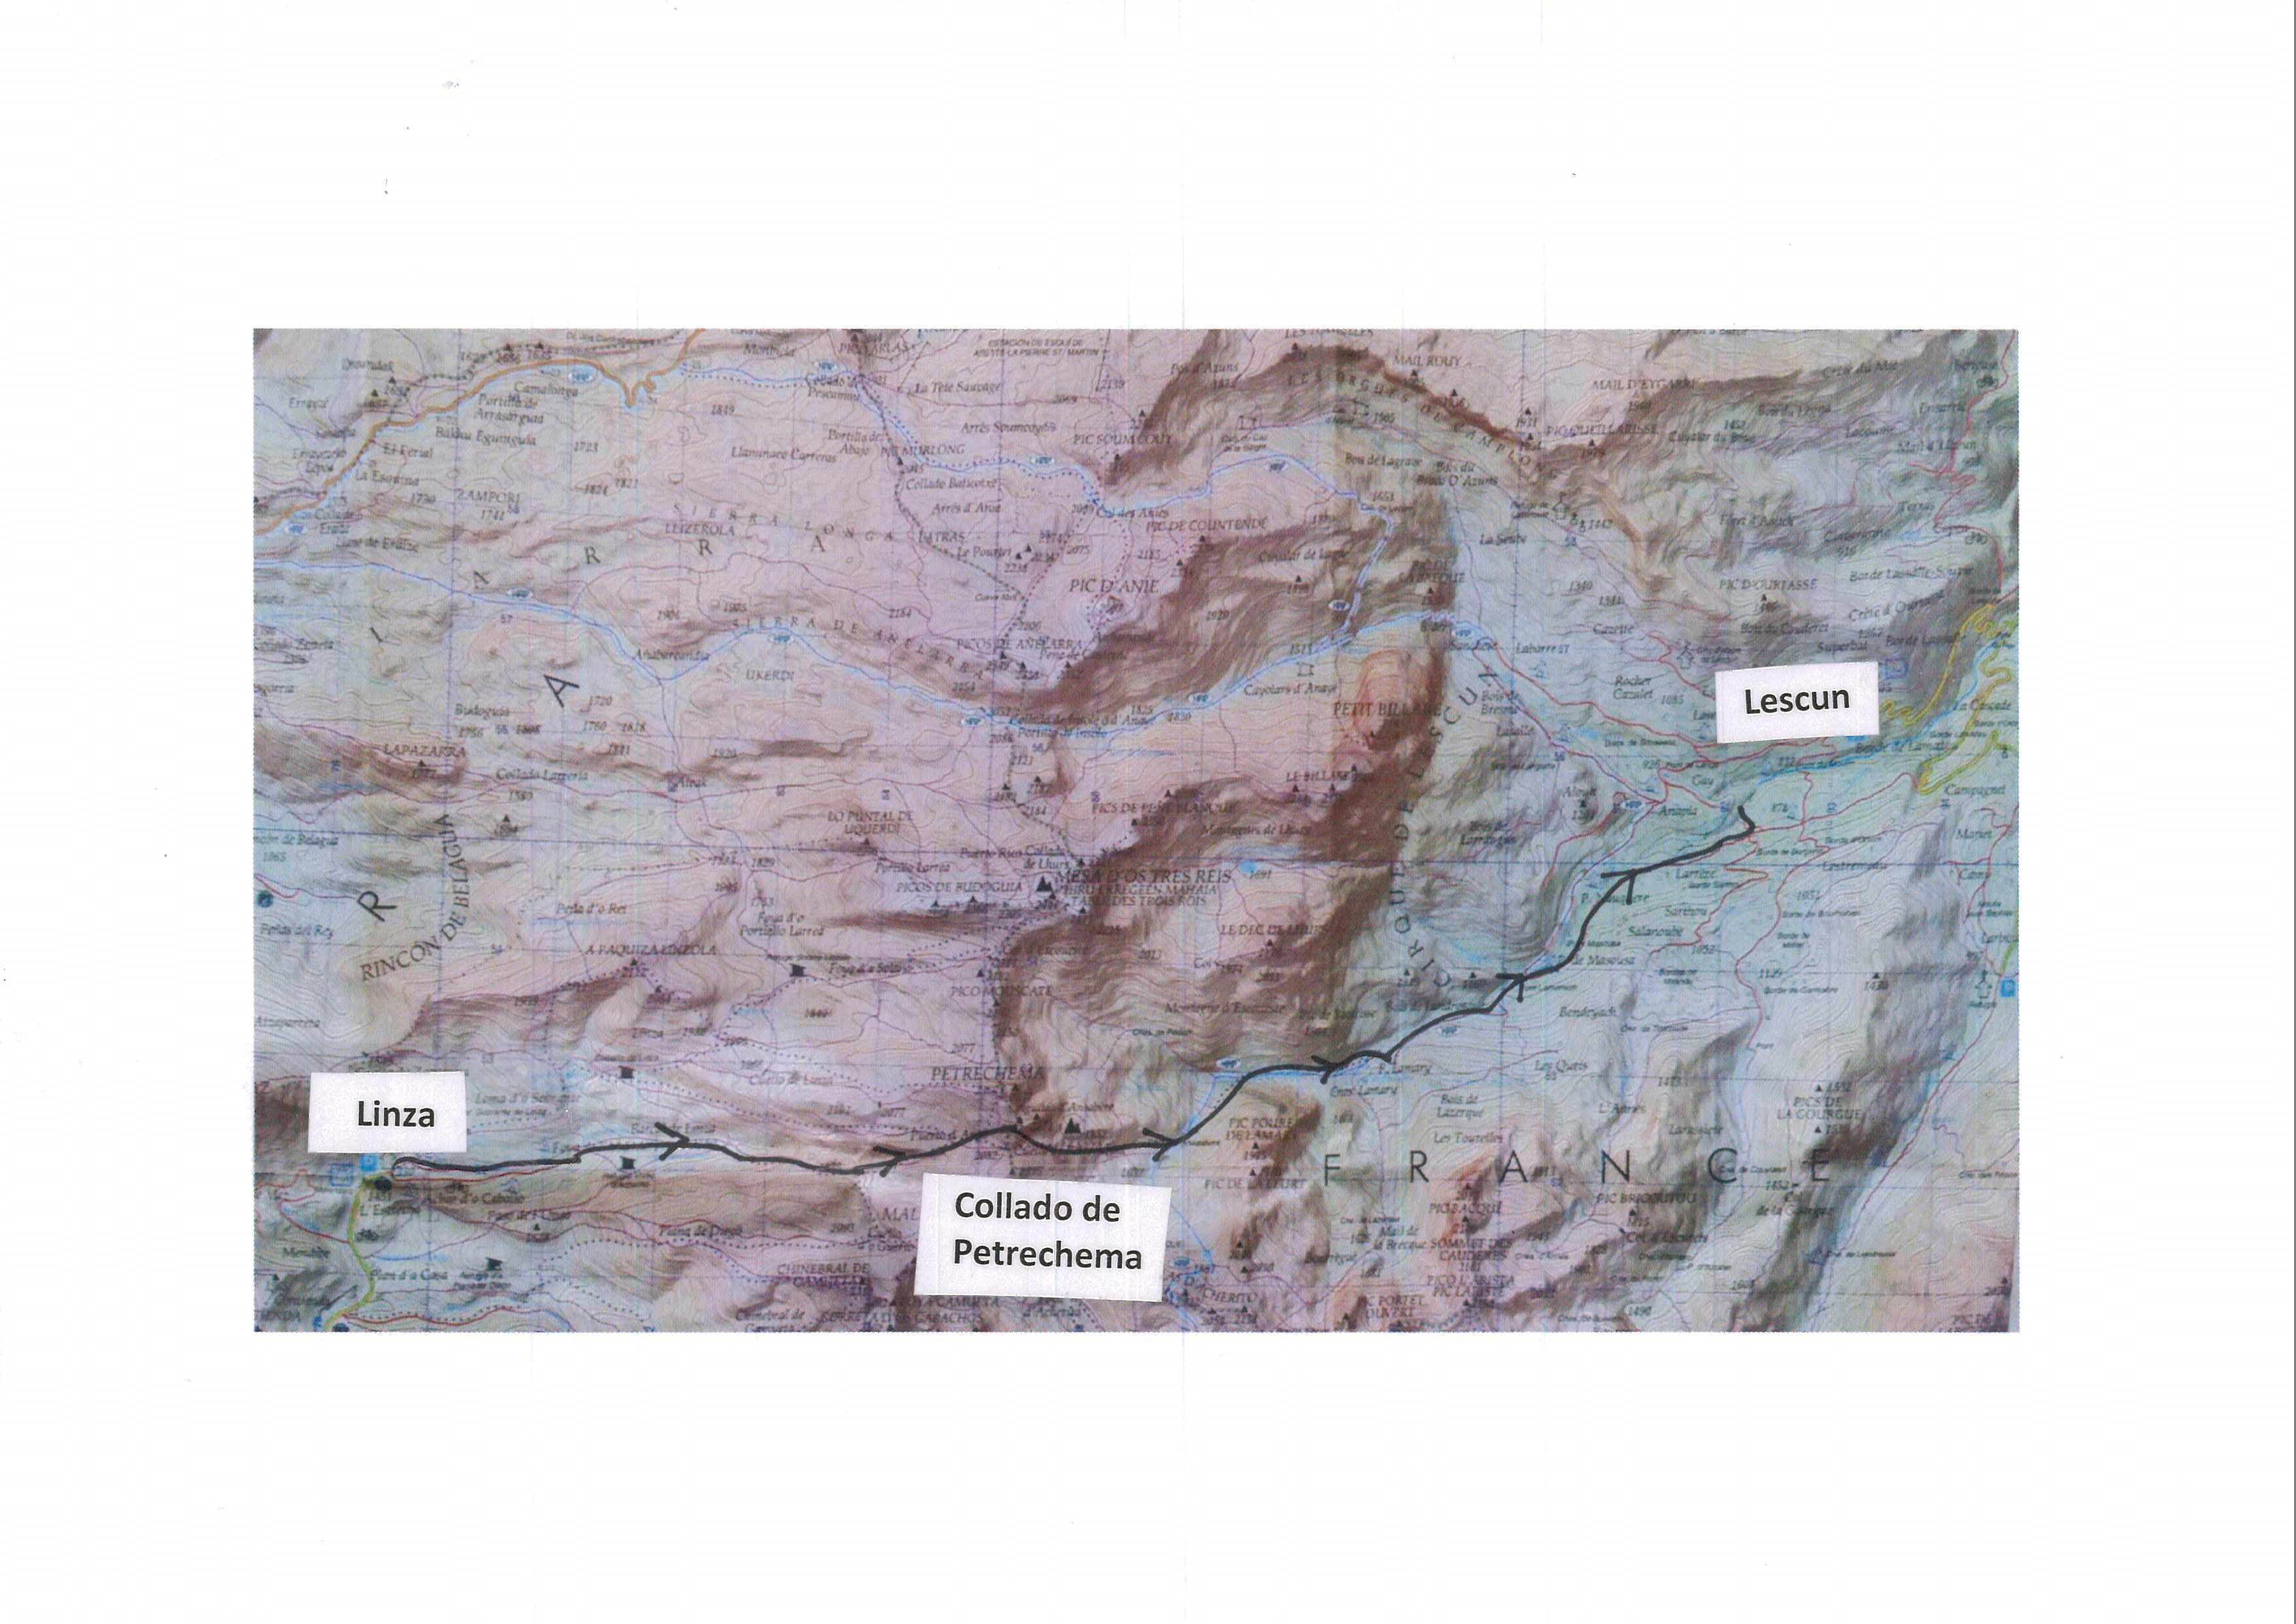 mapa TAA 433-Linza-Lescun